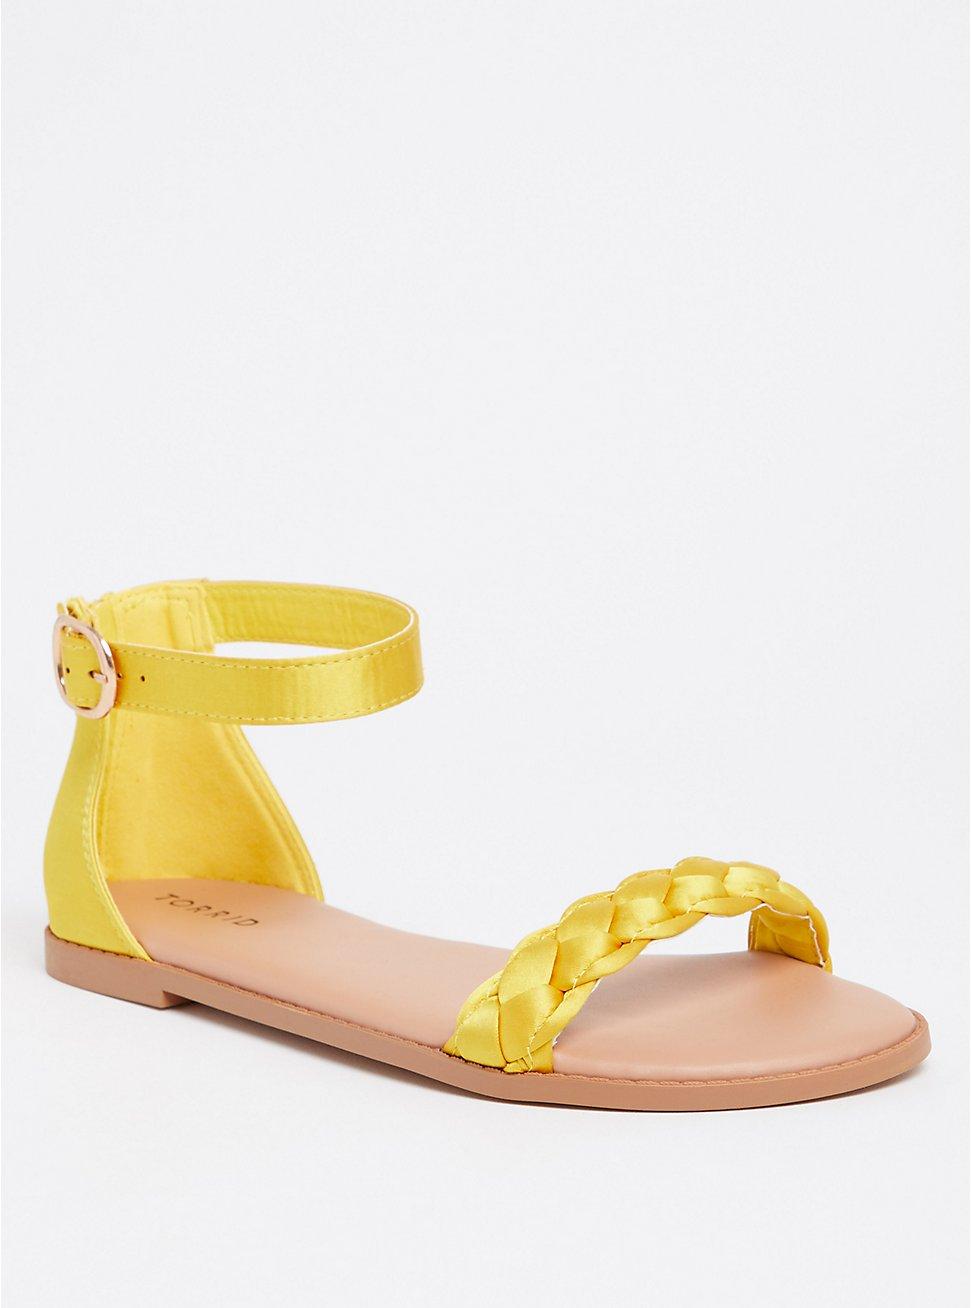 Yellow Satin Braided Sandal (WW), YELLOW, hi-res